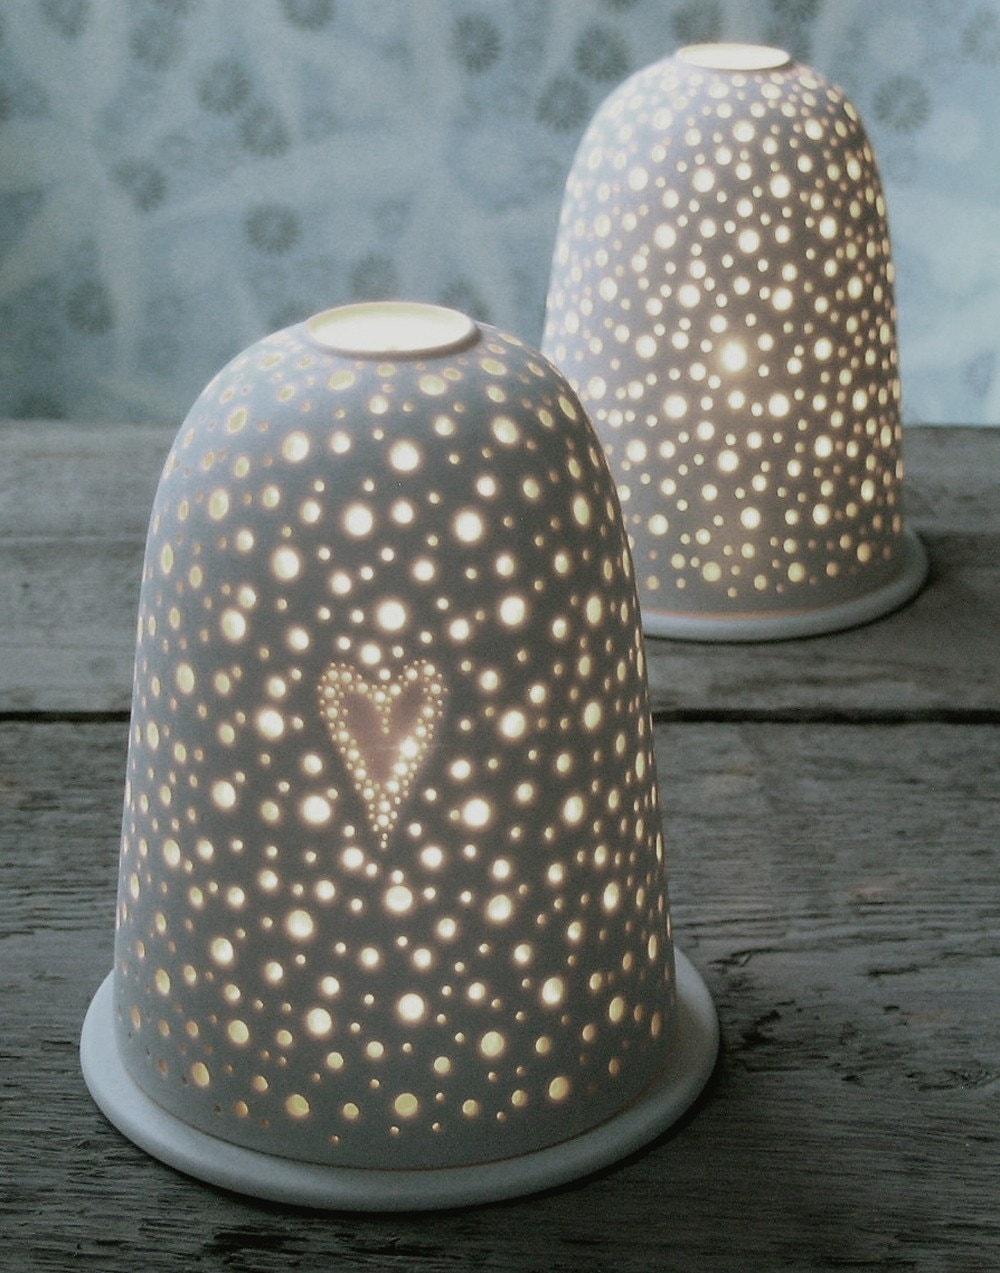 Medium Valentines Tea Light Holder White Porcelain Ceramic